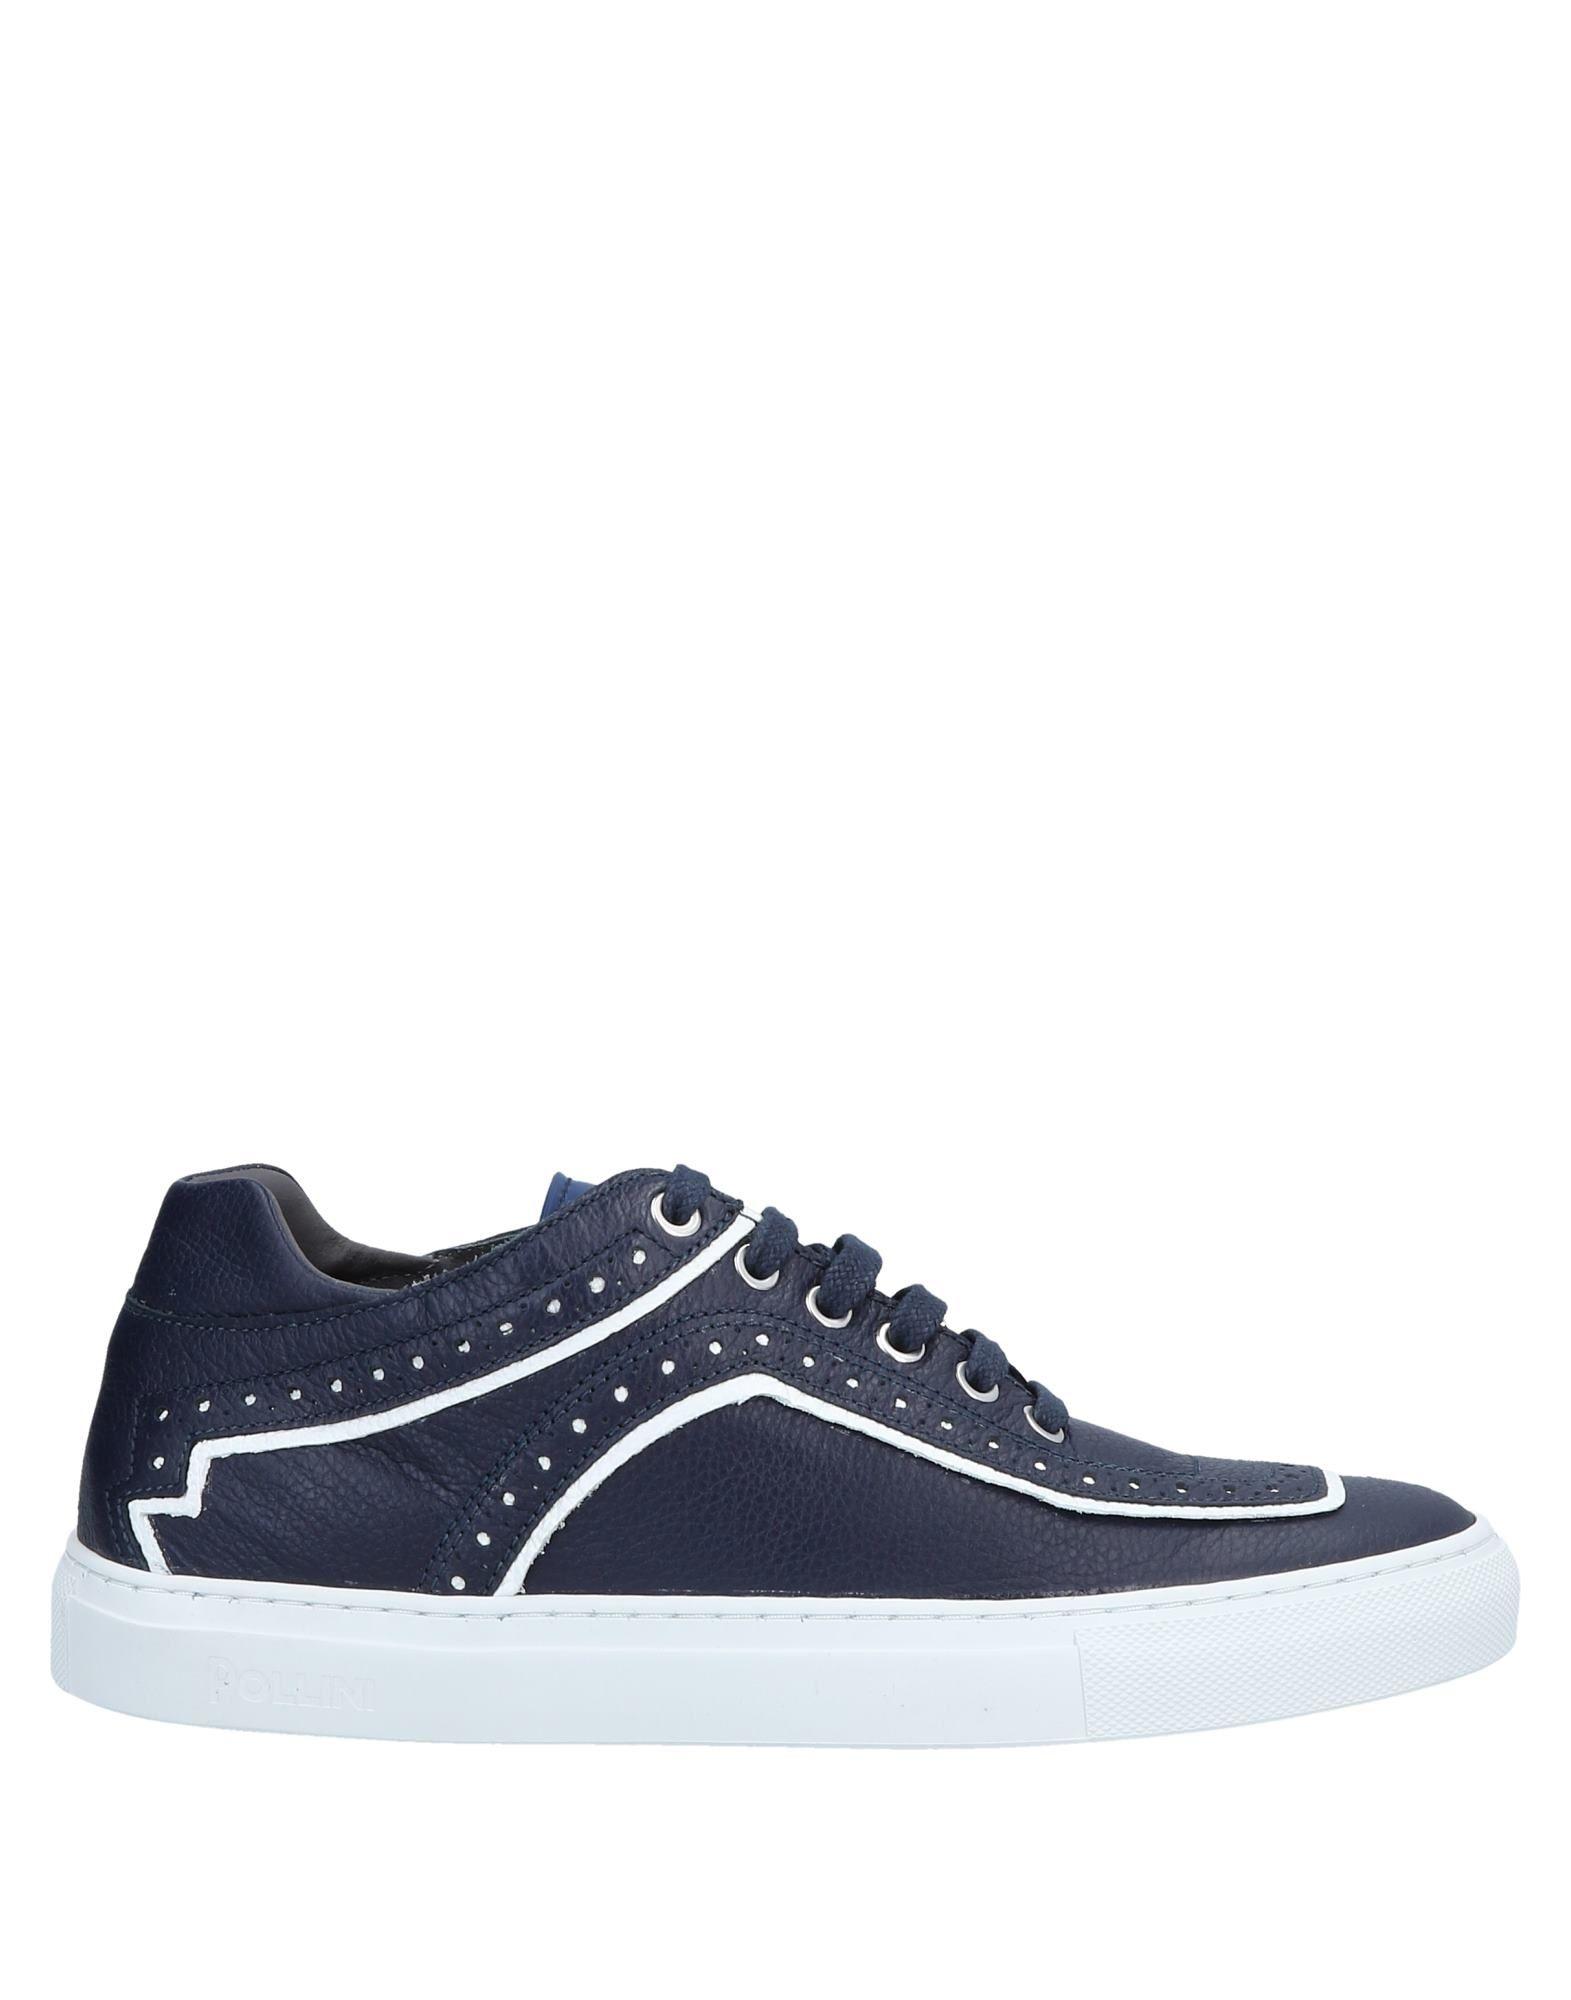 Pollini Sneakers - Canada Men Pollini Sneakers online on  Canada - - 11563443SK 703300